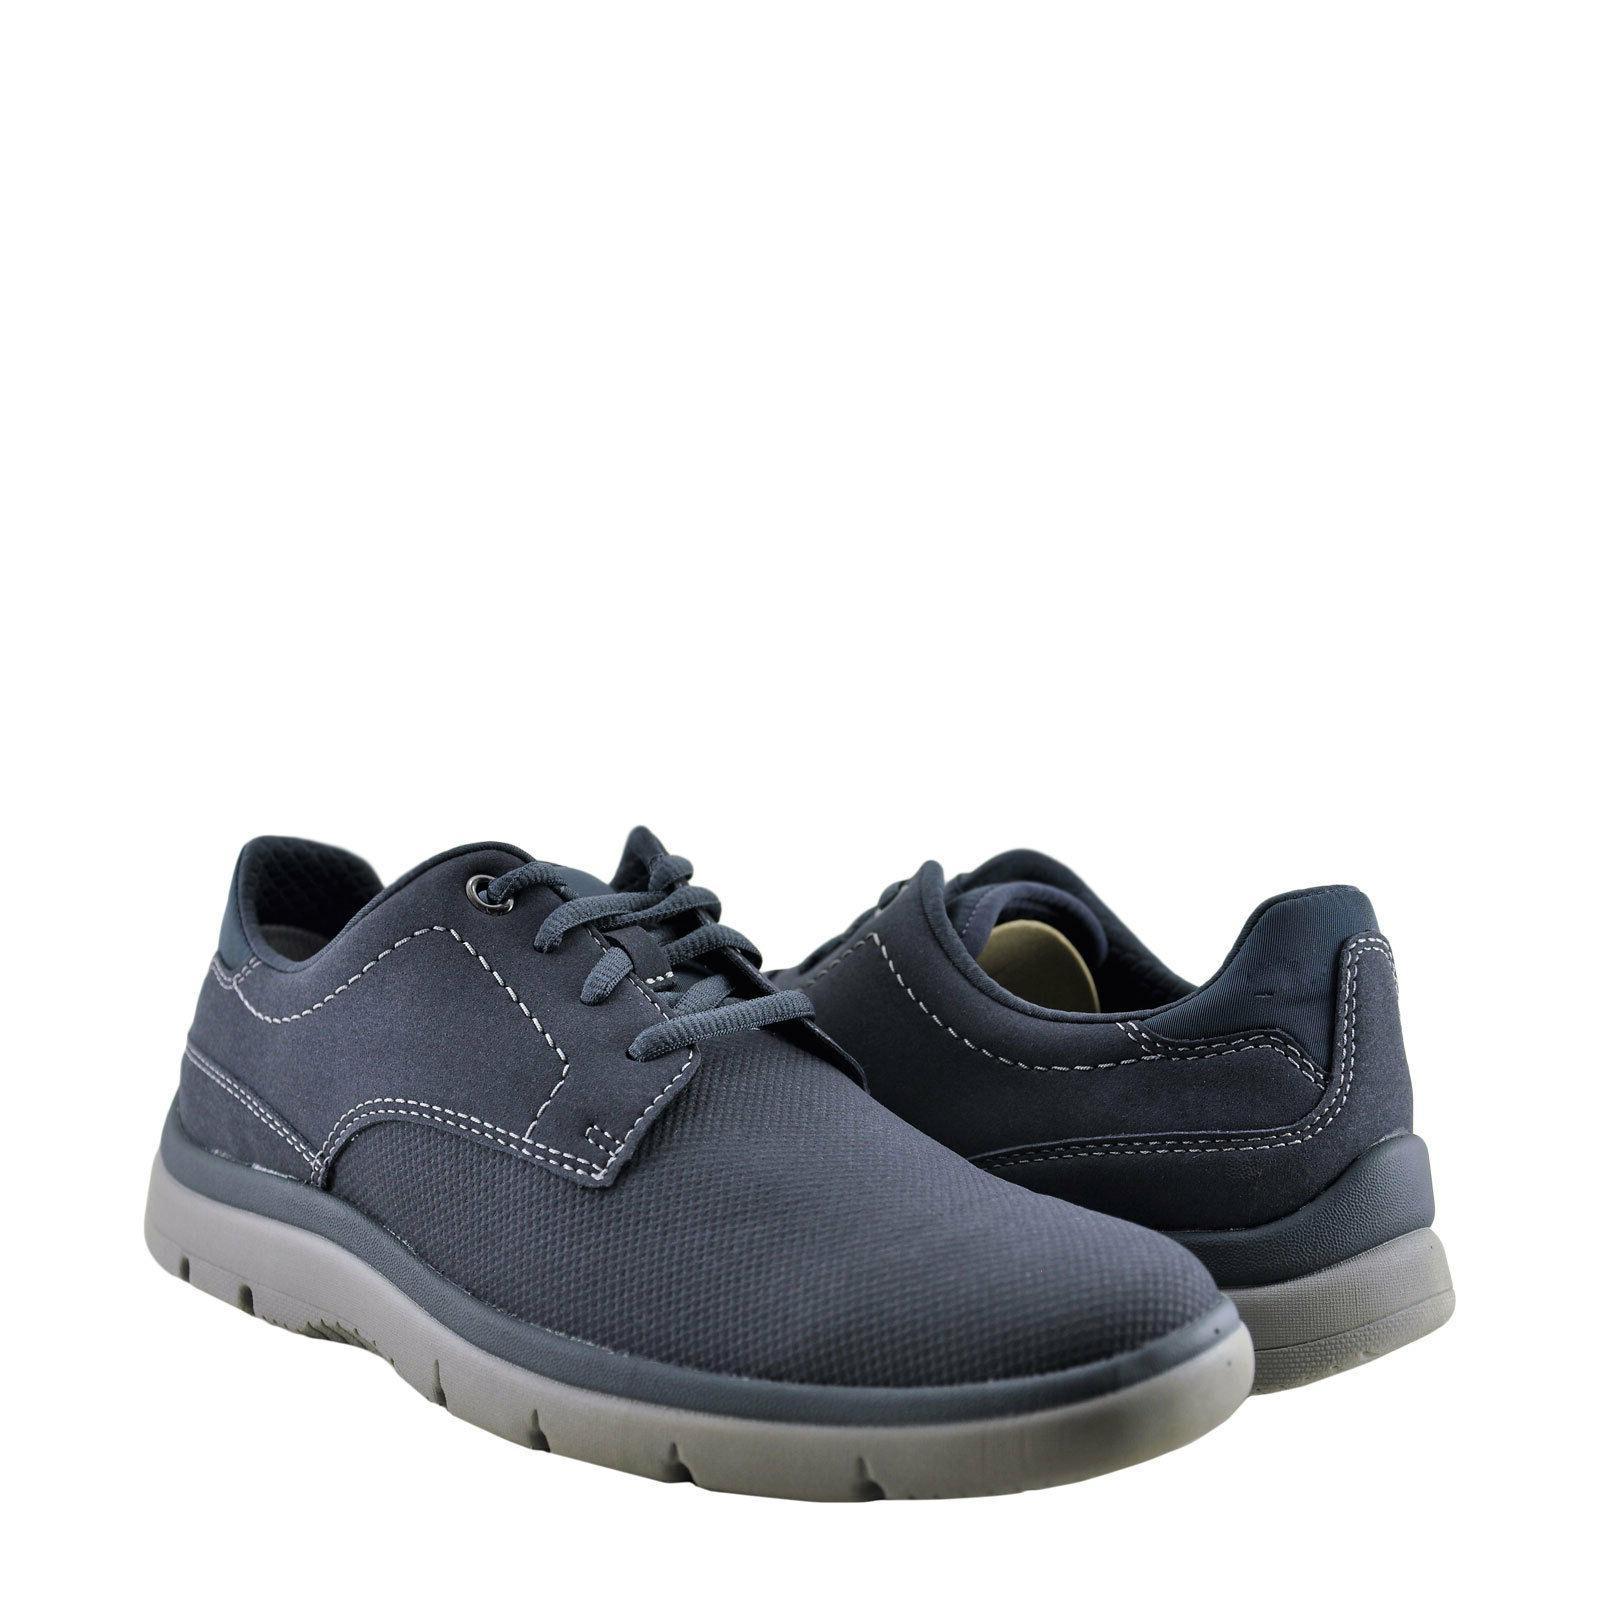 Men's Shoes Clarks Tunsil Plain Oxford Fashion Sneaker 27760